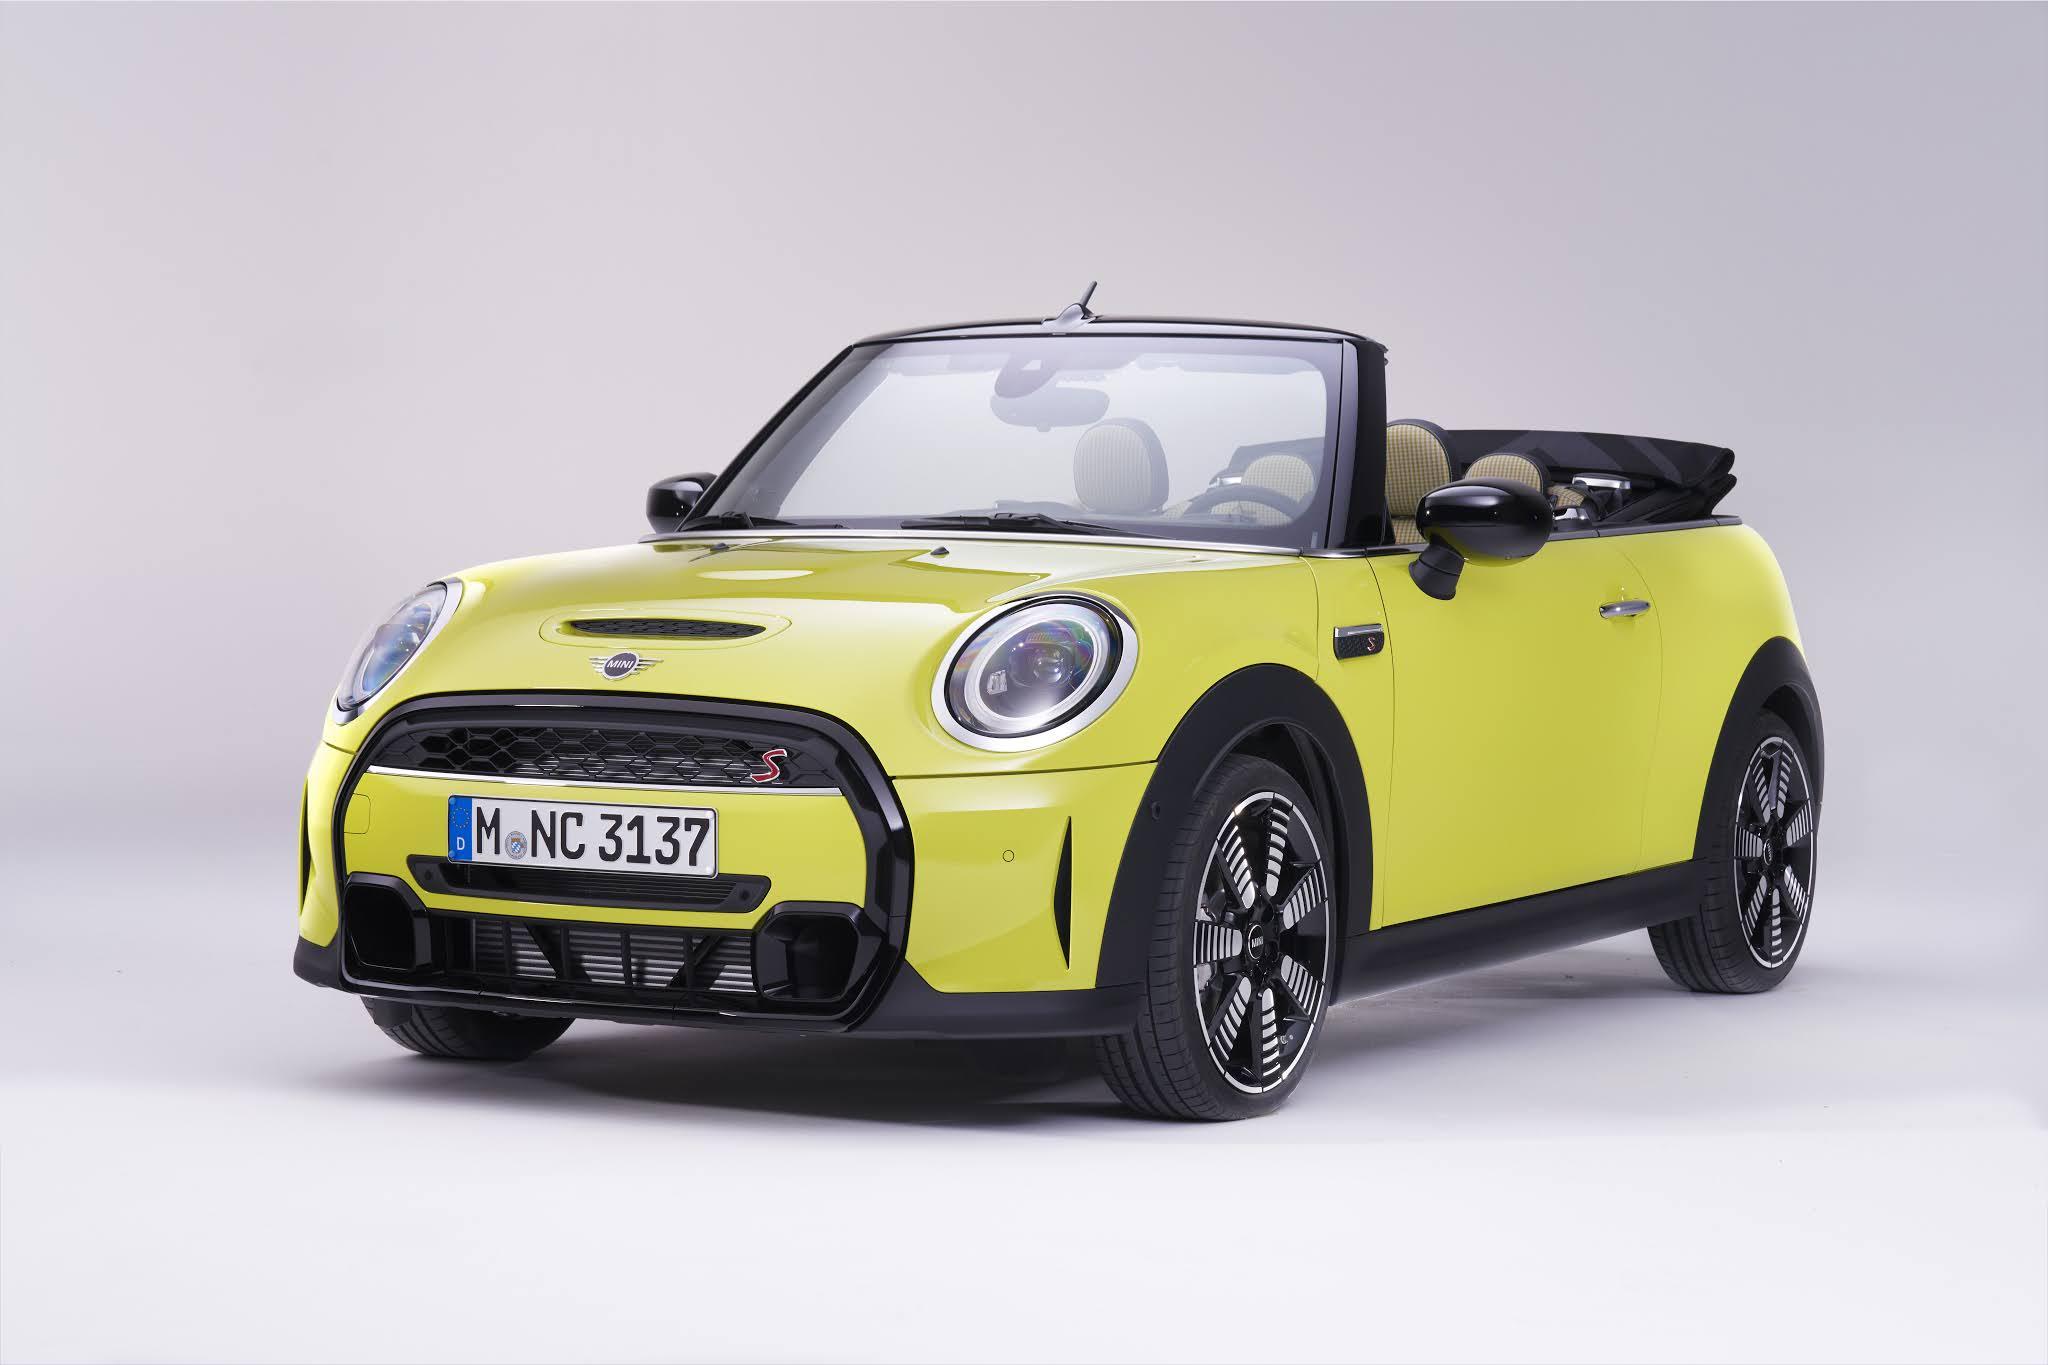 Mini leads small car premium segment with innovation